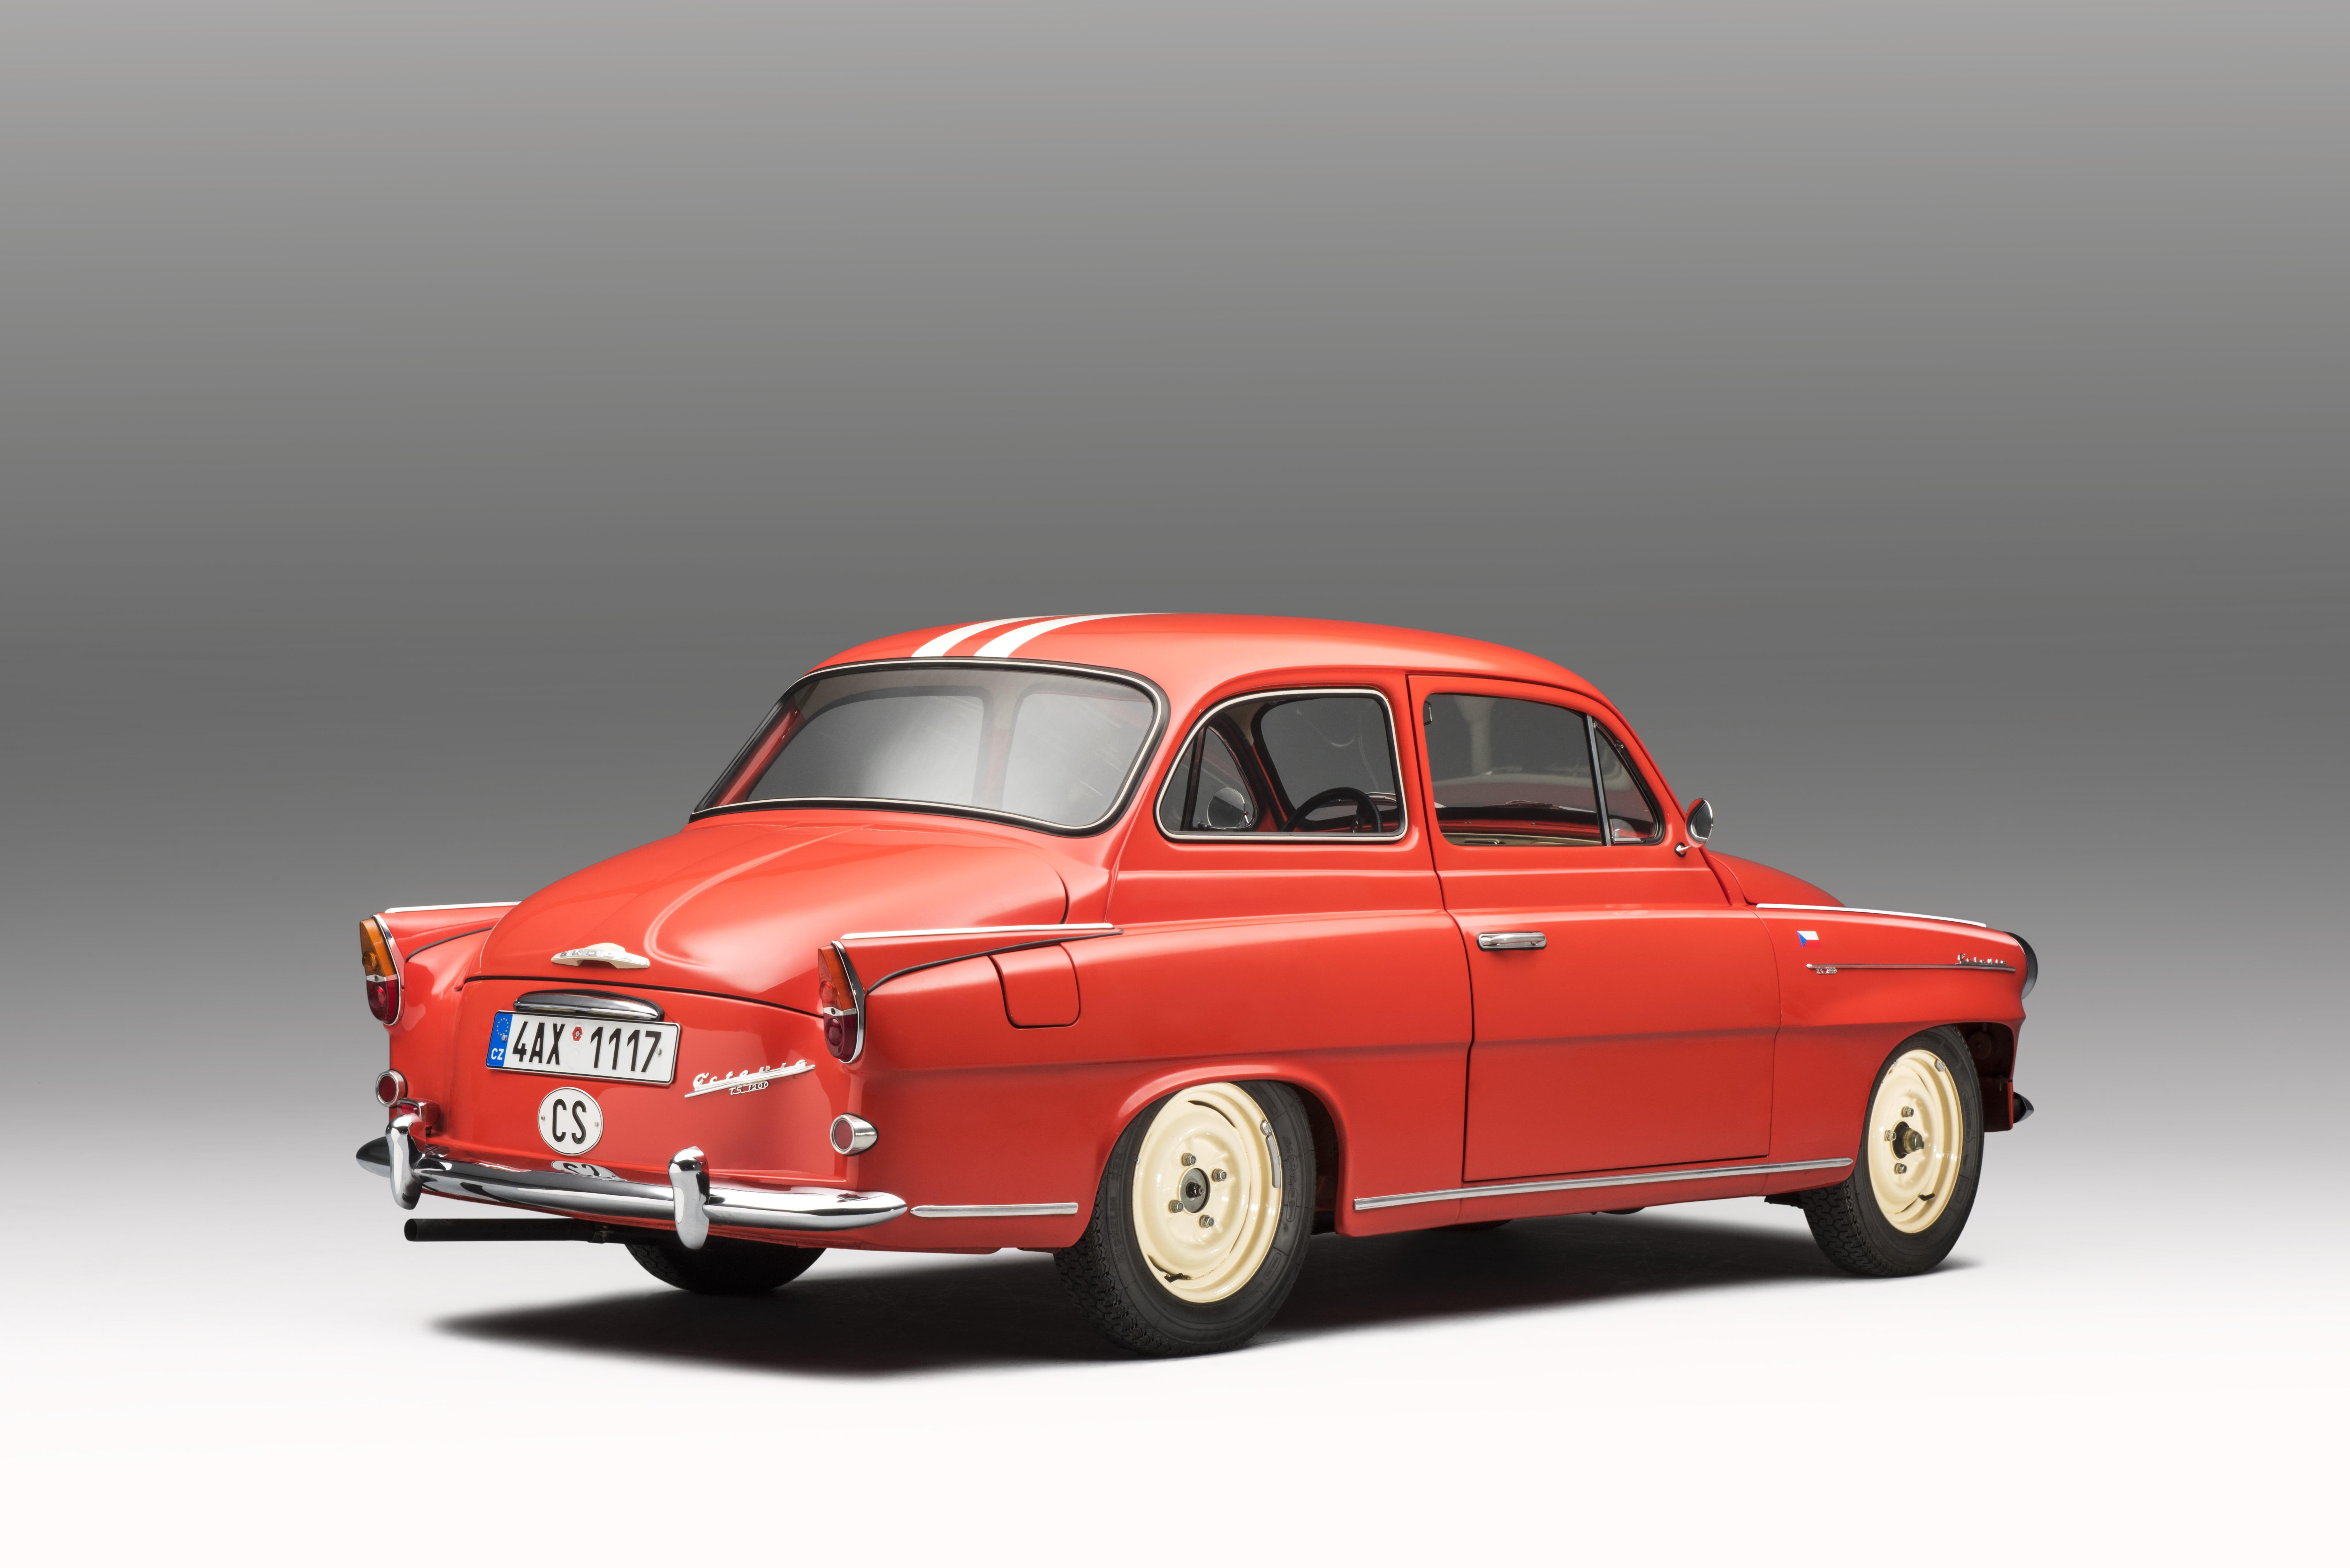 SKODA OCTAVIA TOURING SPORT (1960): Successful return to international rally courses - Image 7